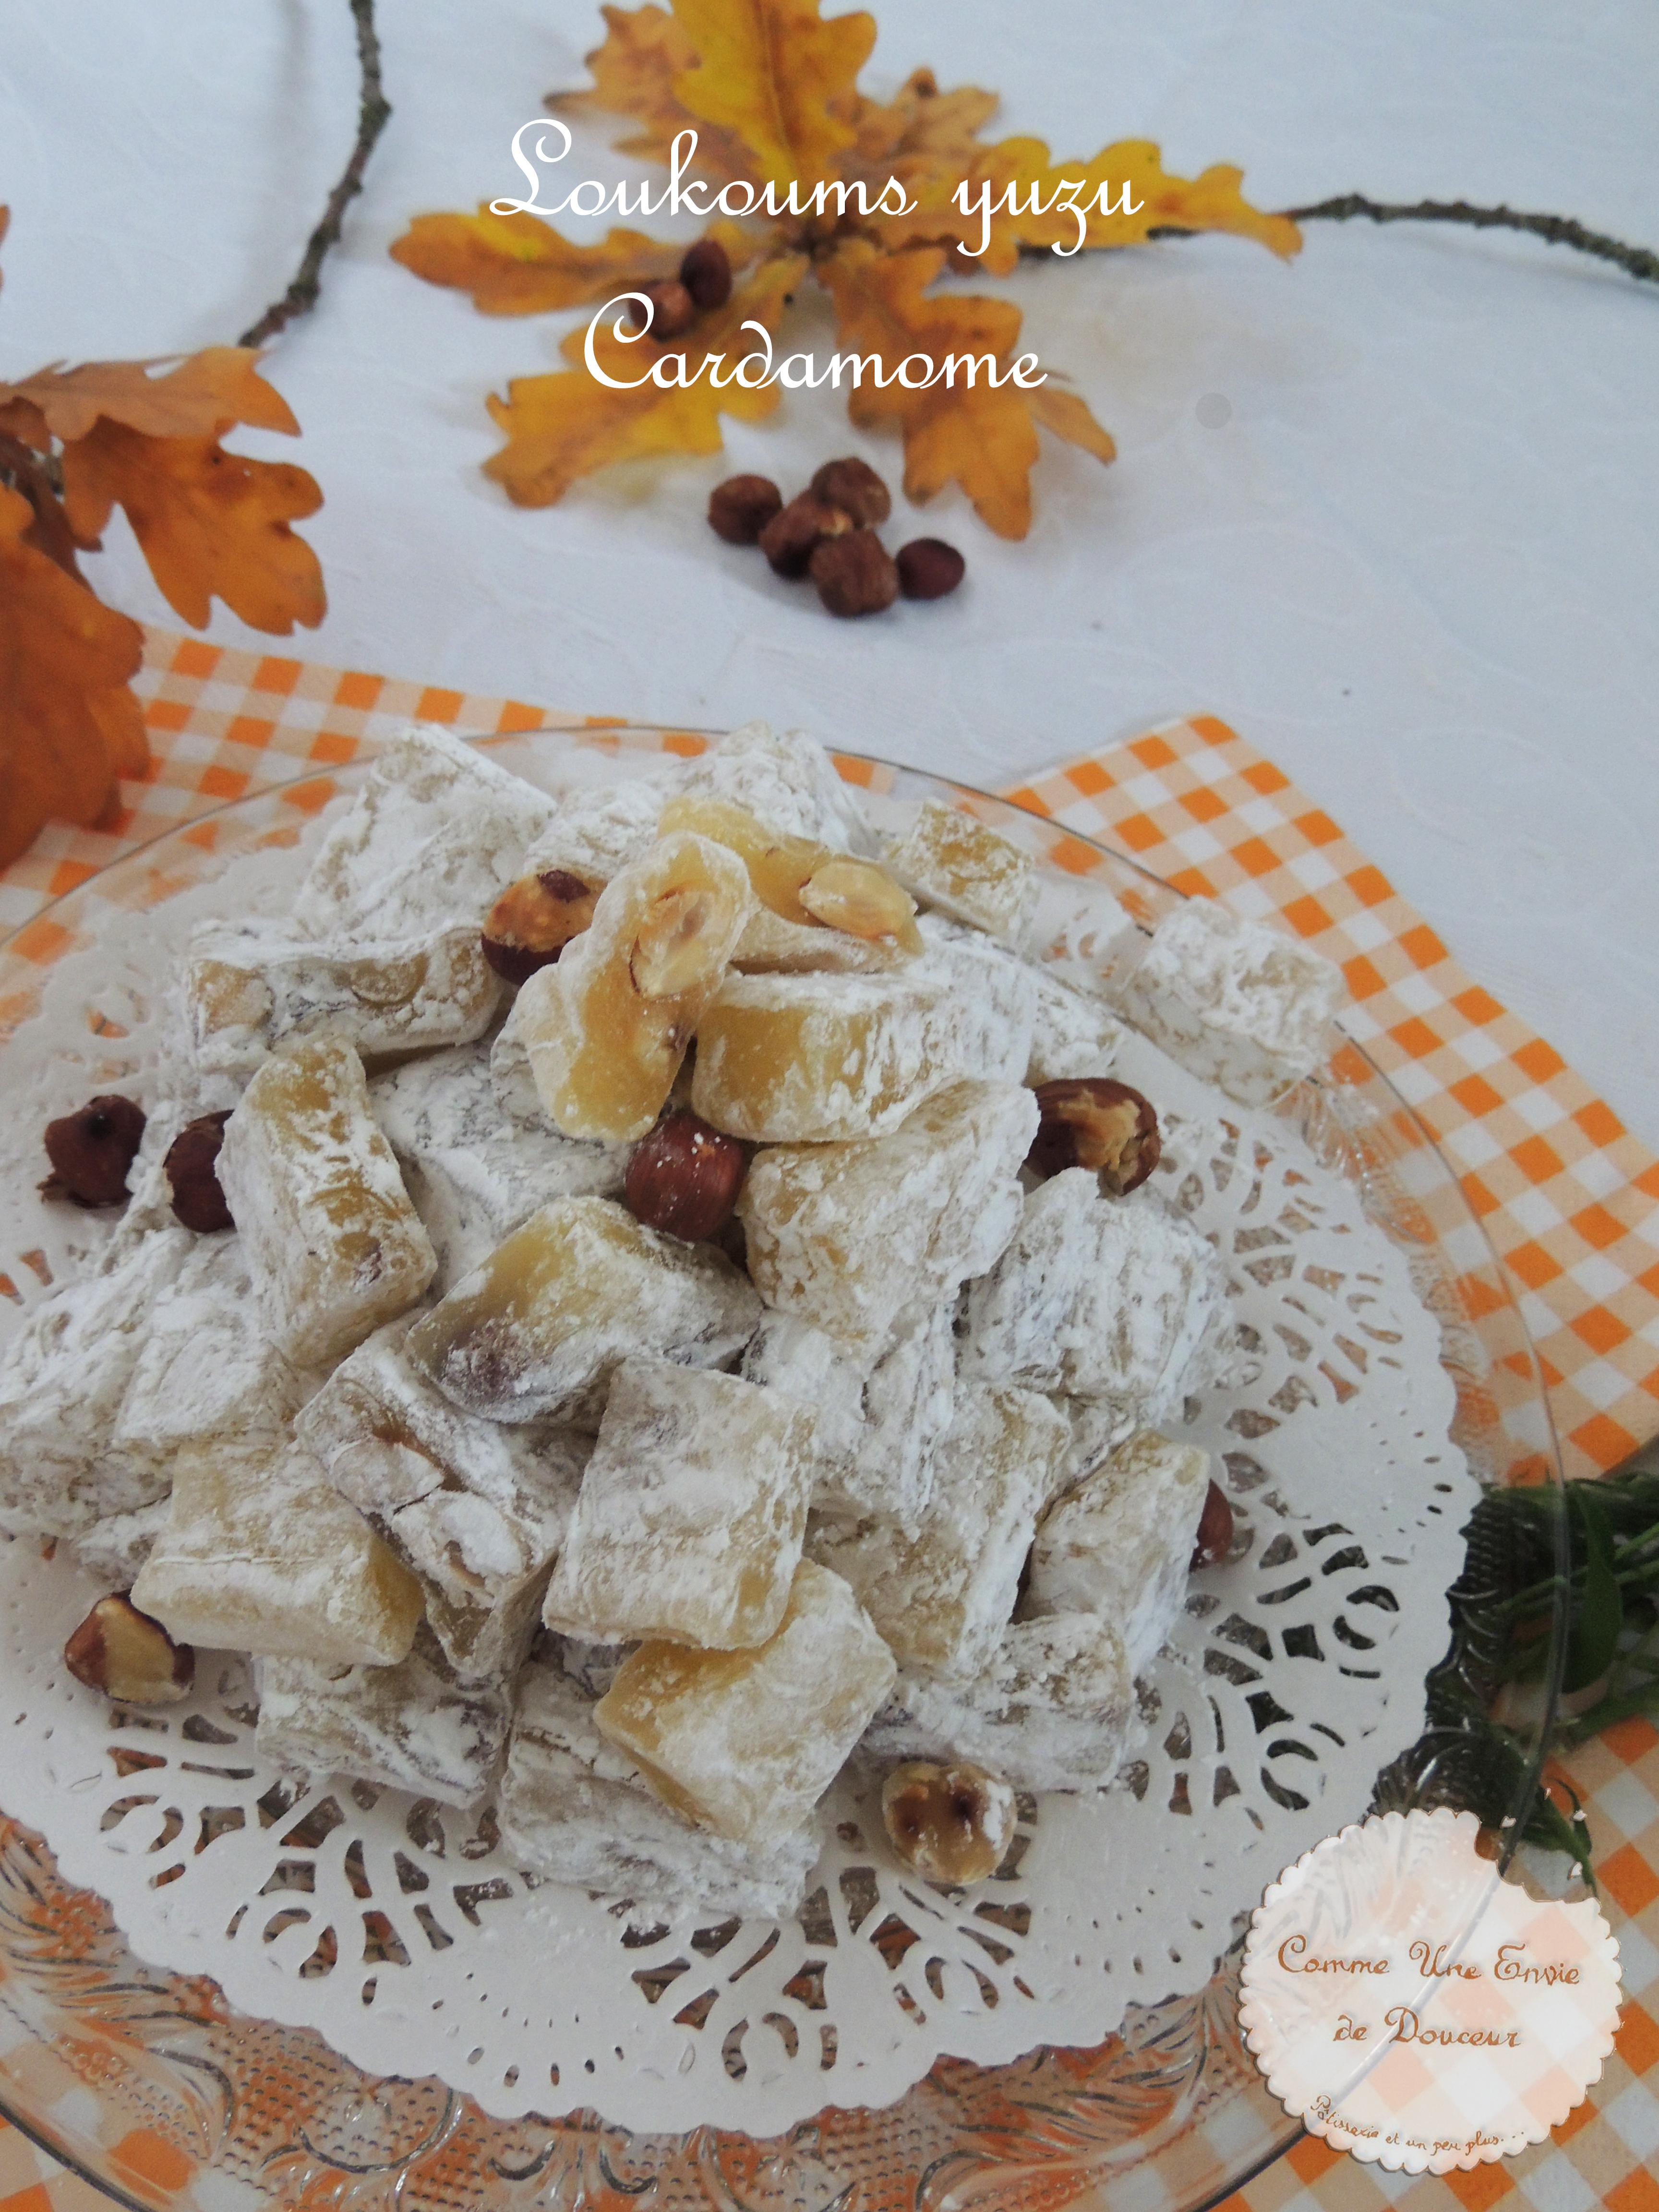 Loukoums noisette yuzu – Halzelnut & yuzu turkish delight